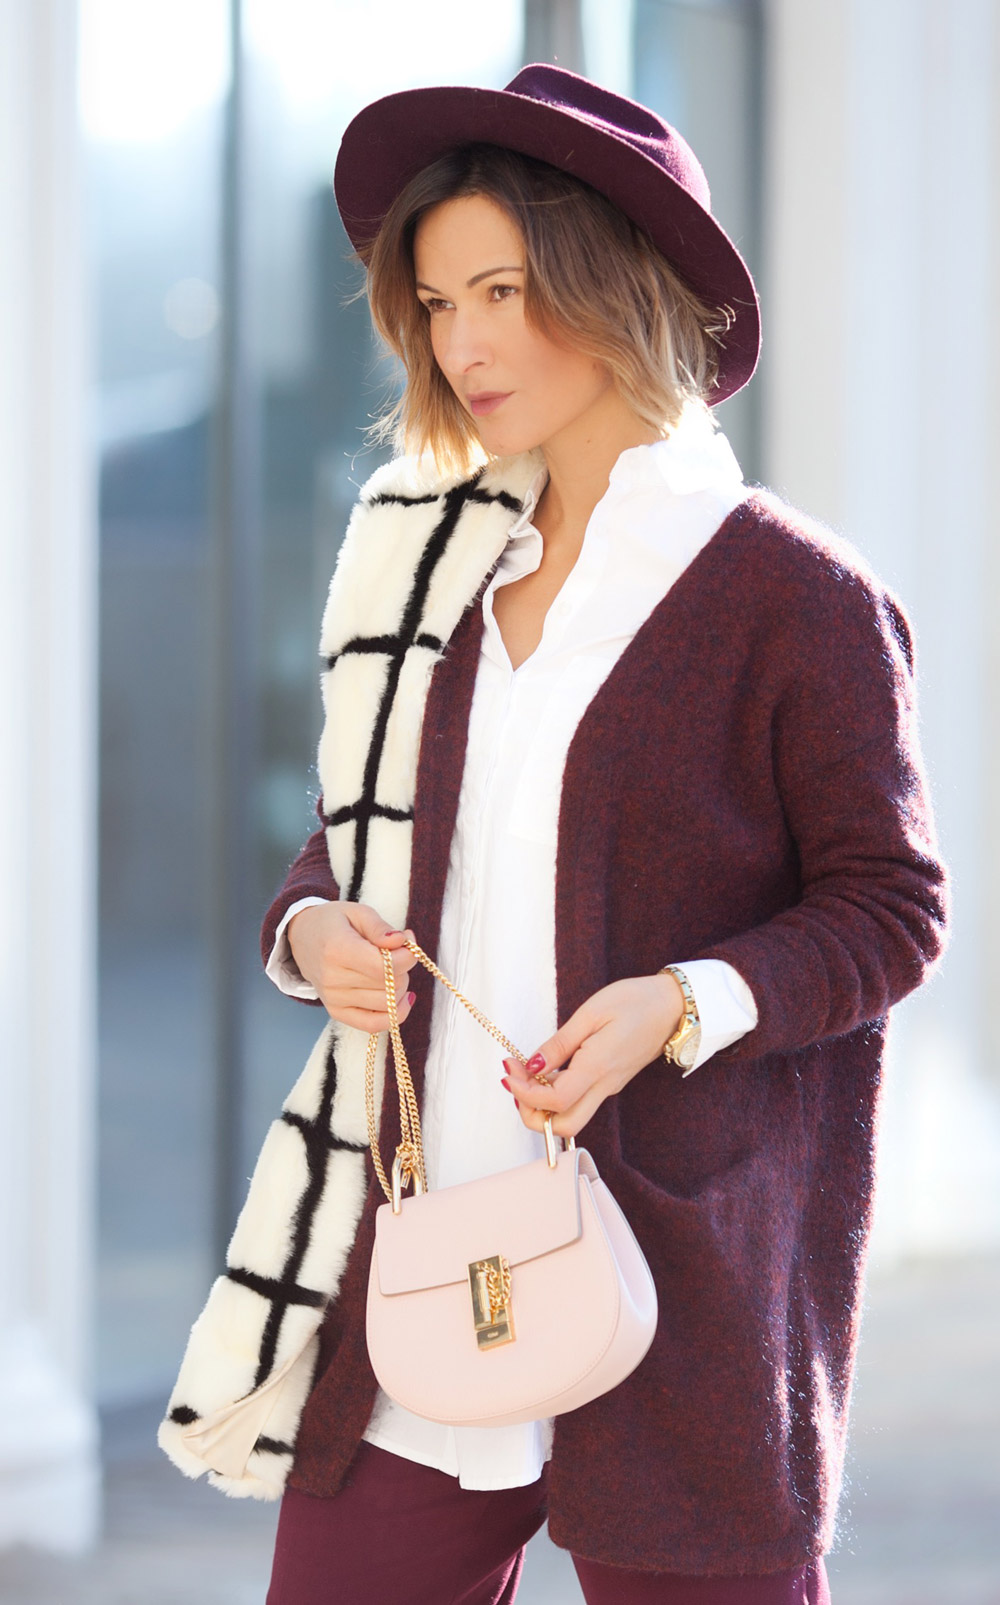 chloe+drew+bag+outfit